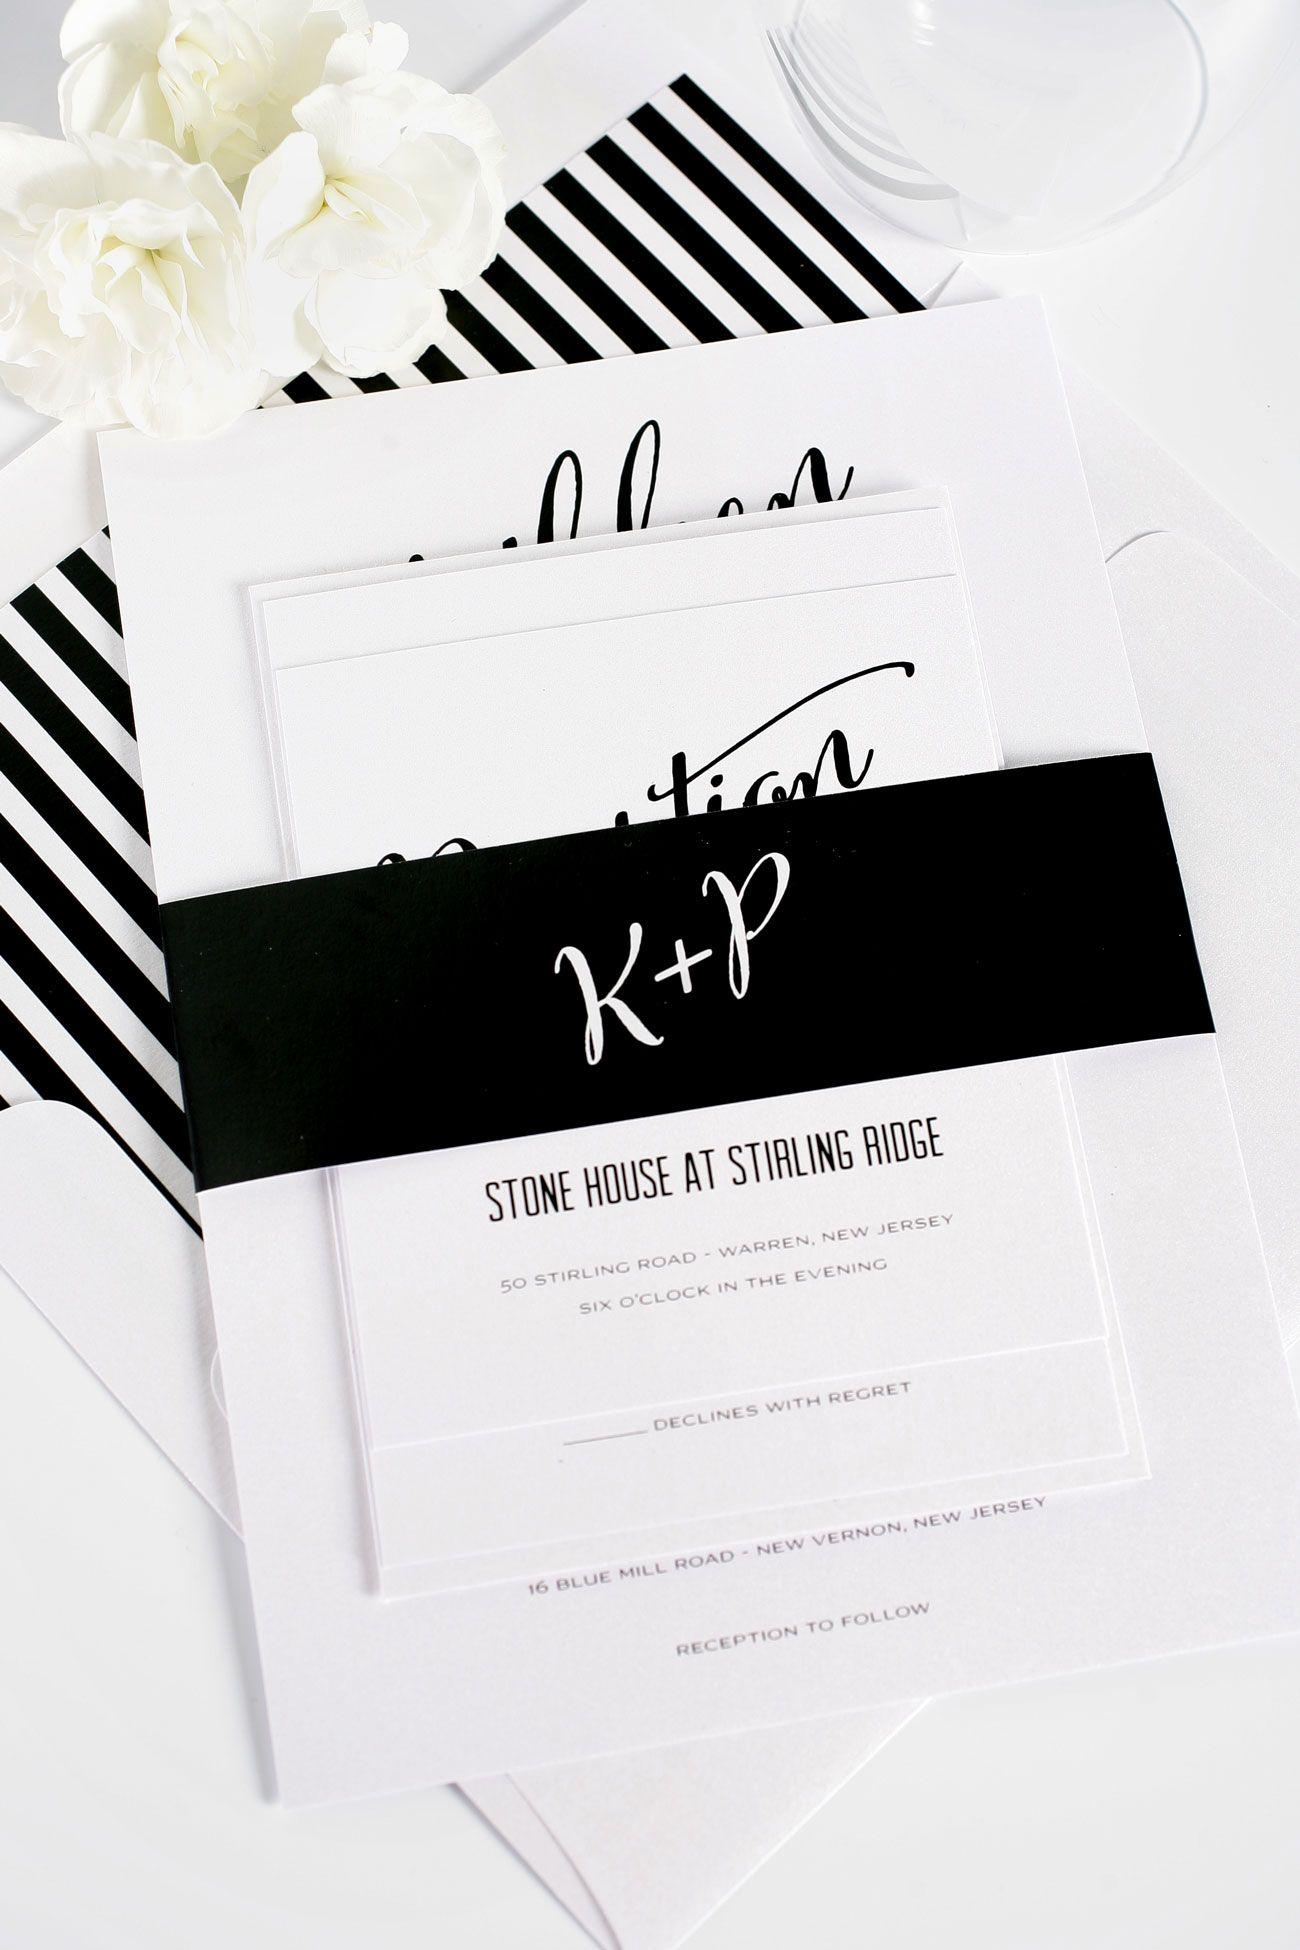 Modern Calligraphy Wedding Invitations in Black and White | Shine ...